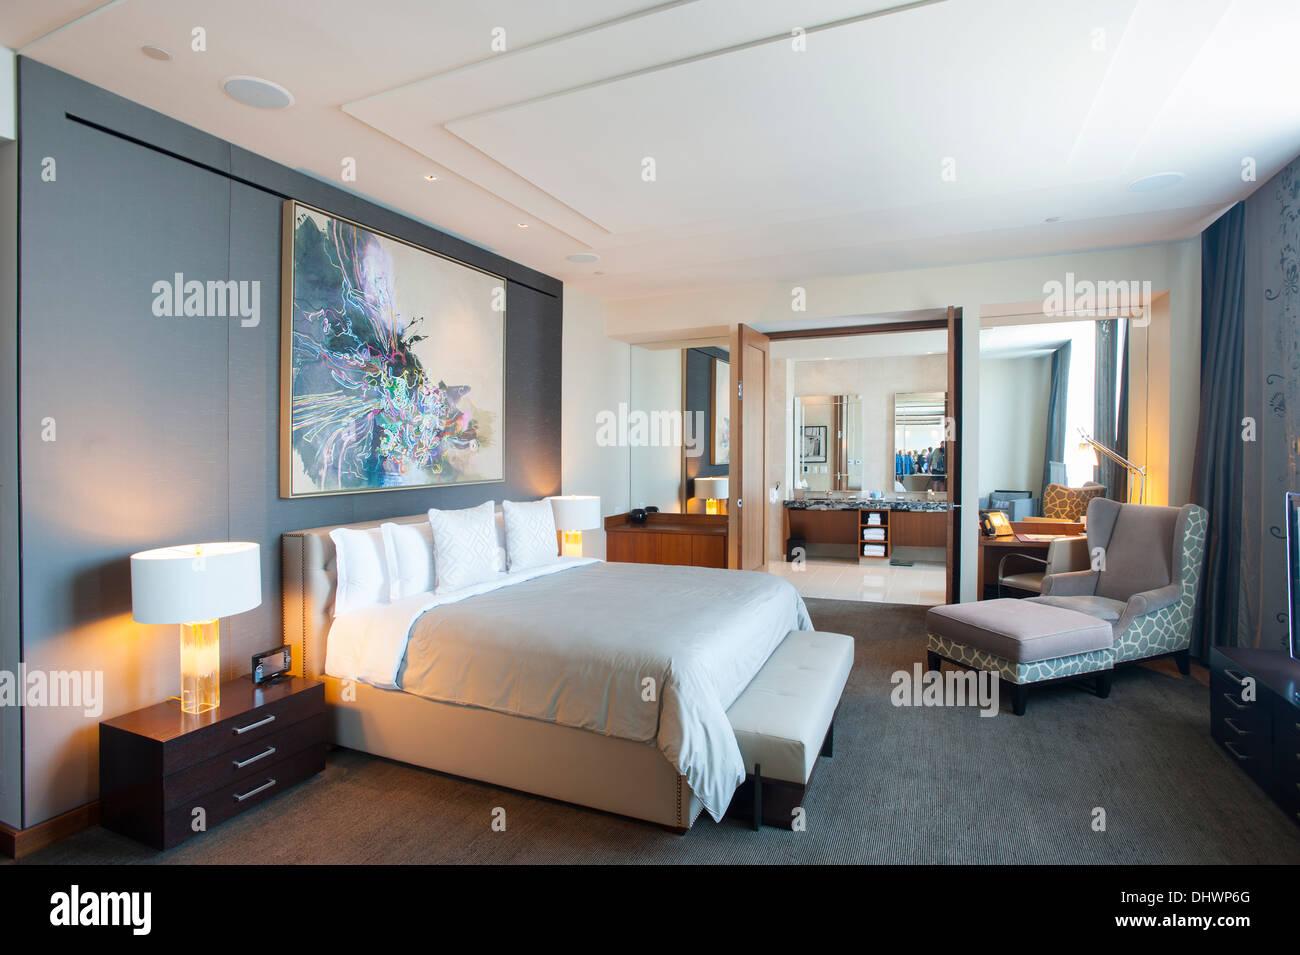 USA America New Jersey NJ N.J. Atlantic City Revel Casino Hotel on the boardwalk high roller suite bedroom Stock Photo